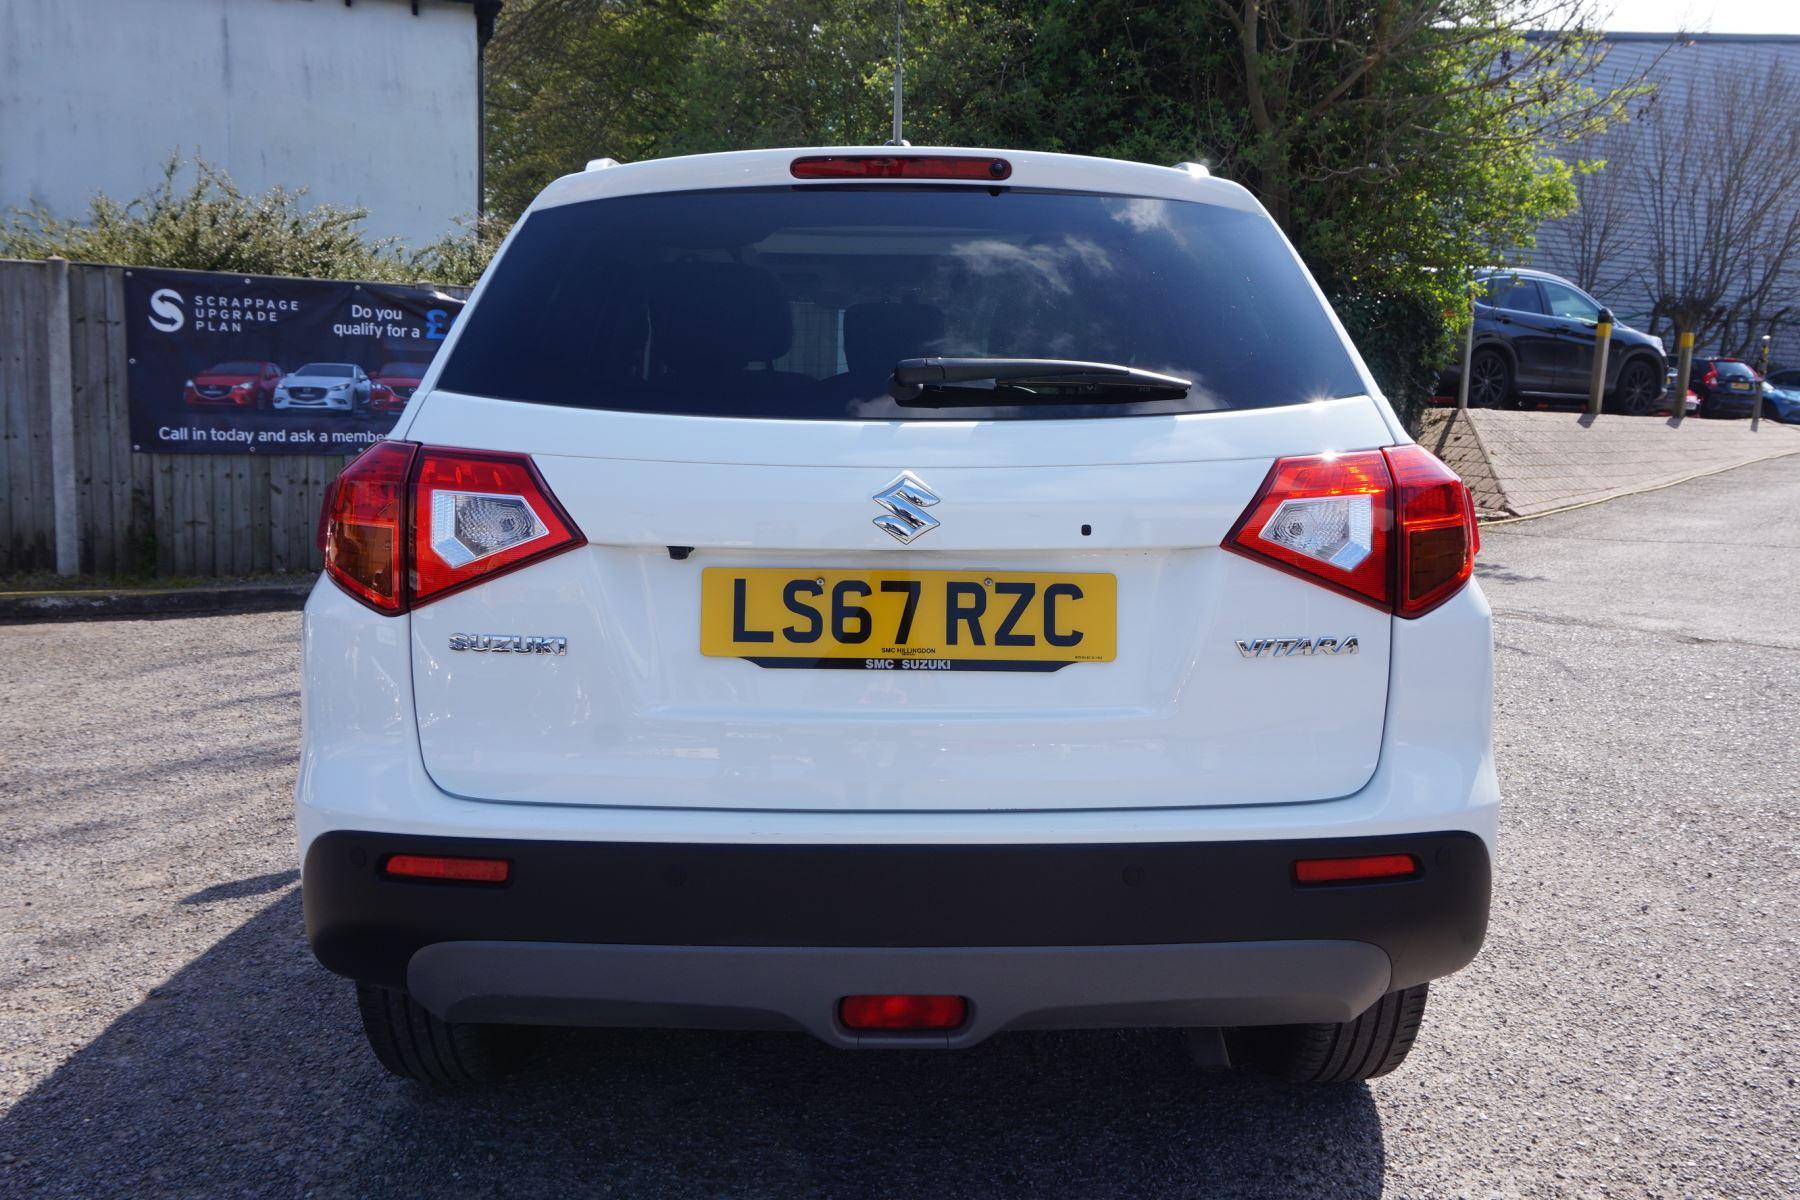 Suzuki Vitara 1 6 SZ5 5dr 2WD Estate (2017) available from Renault Bury